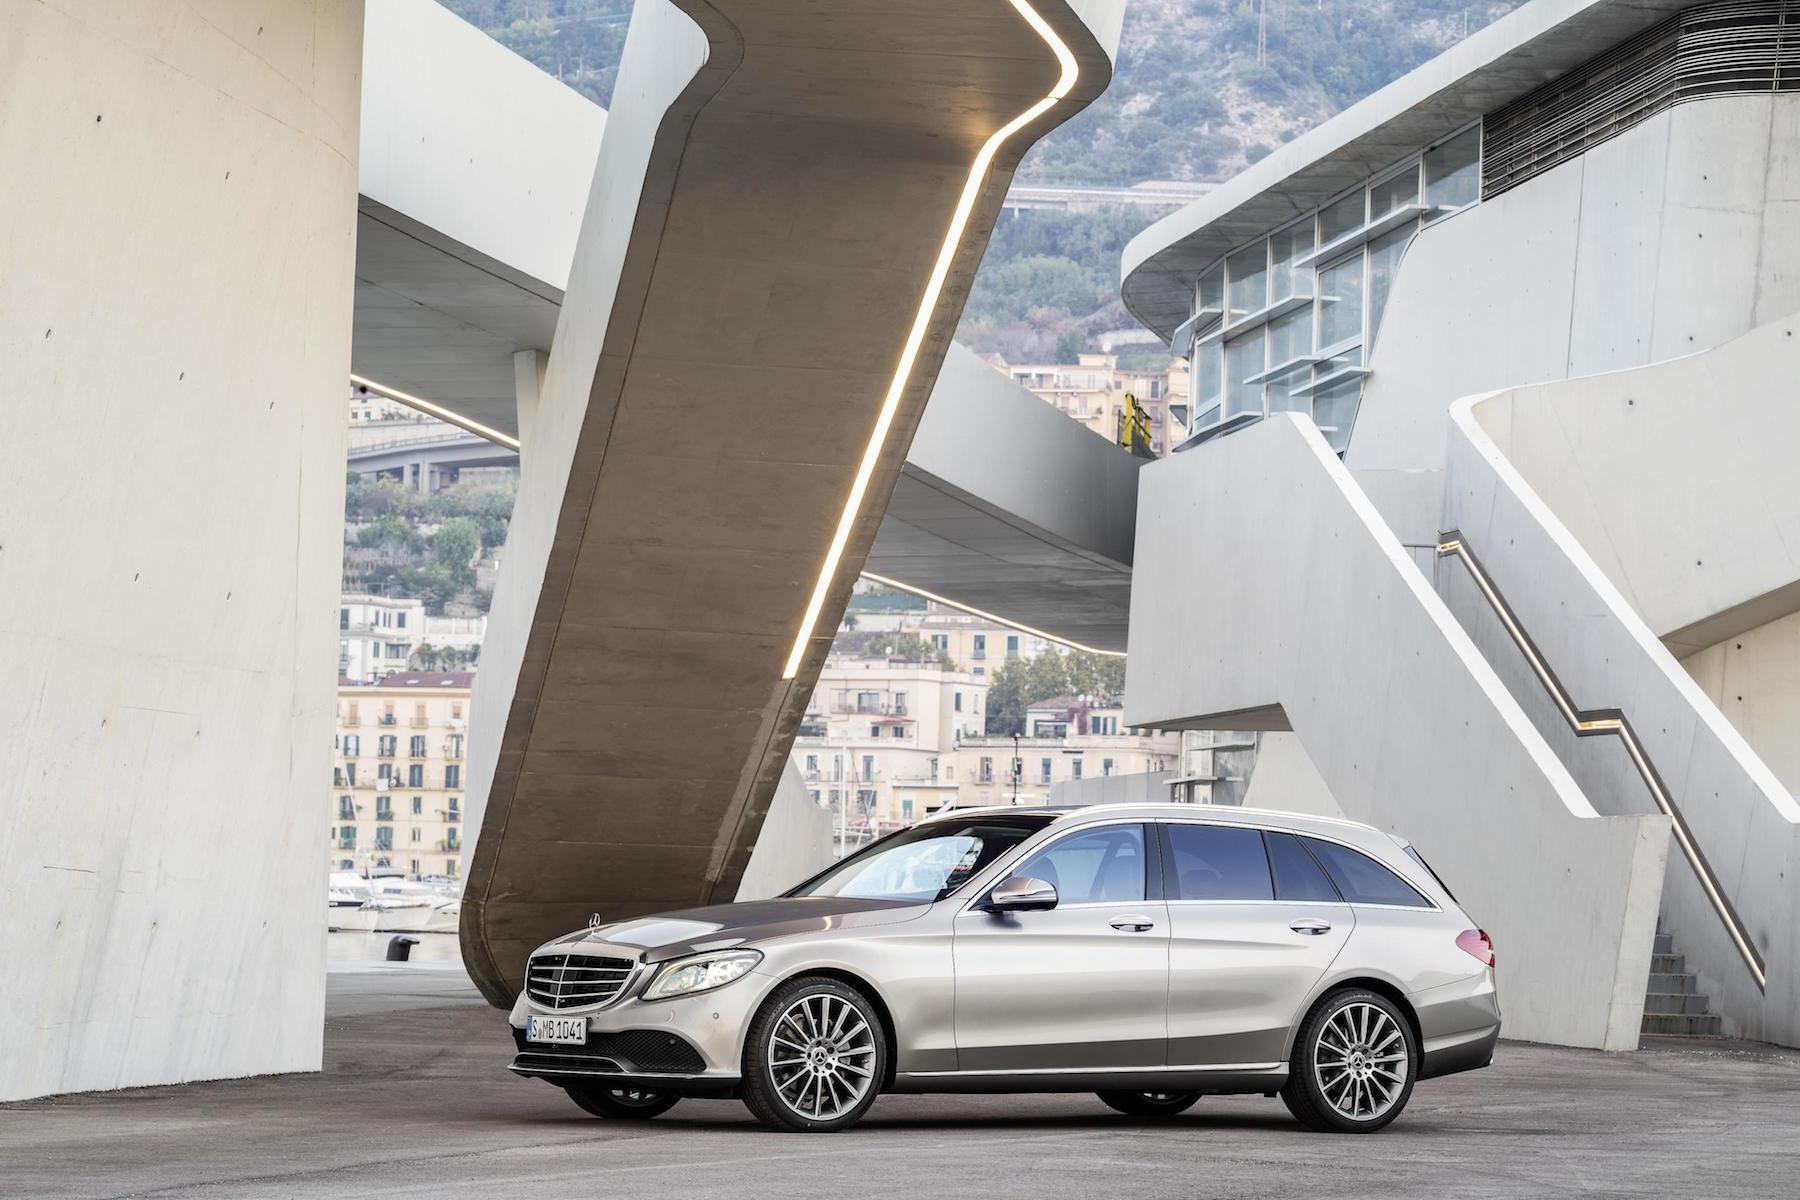 Facelifted 2018 Mercedes Benz C Class